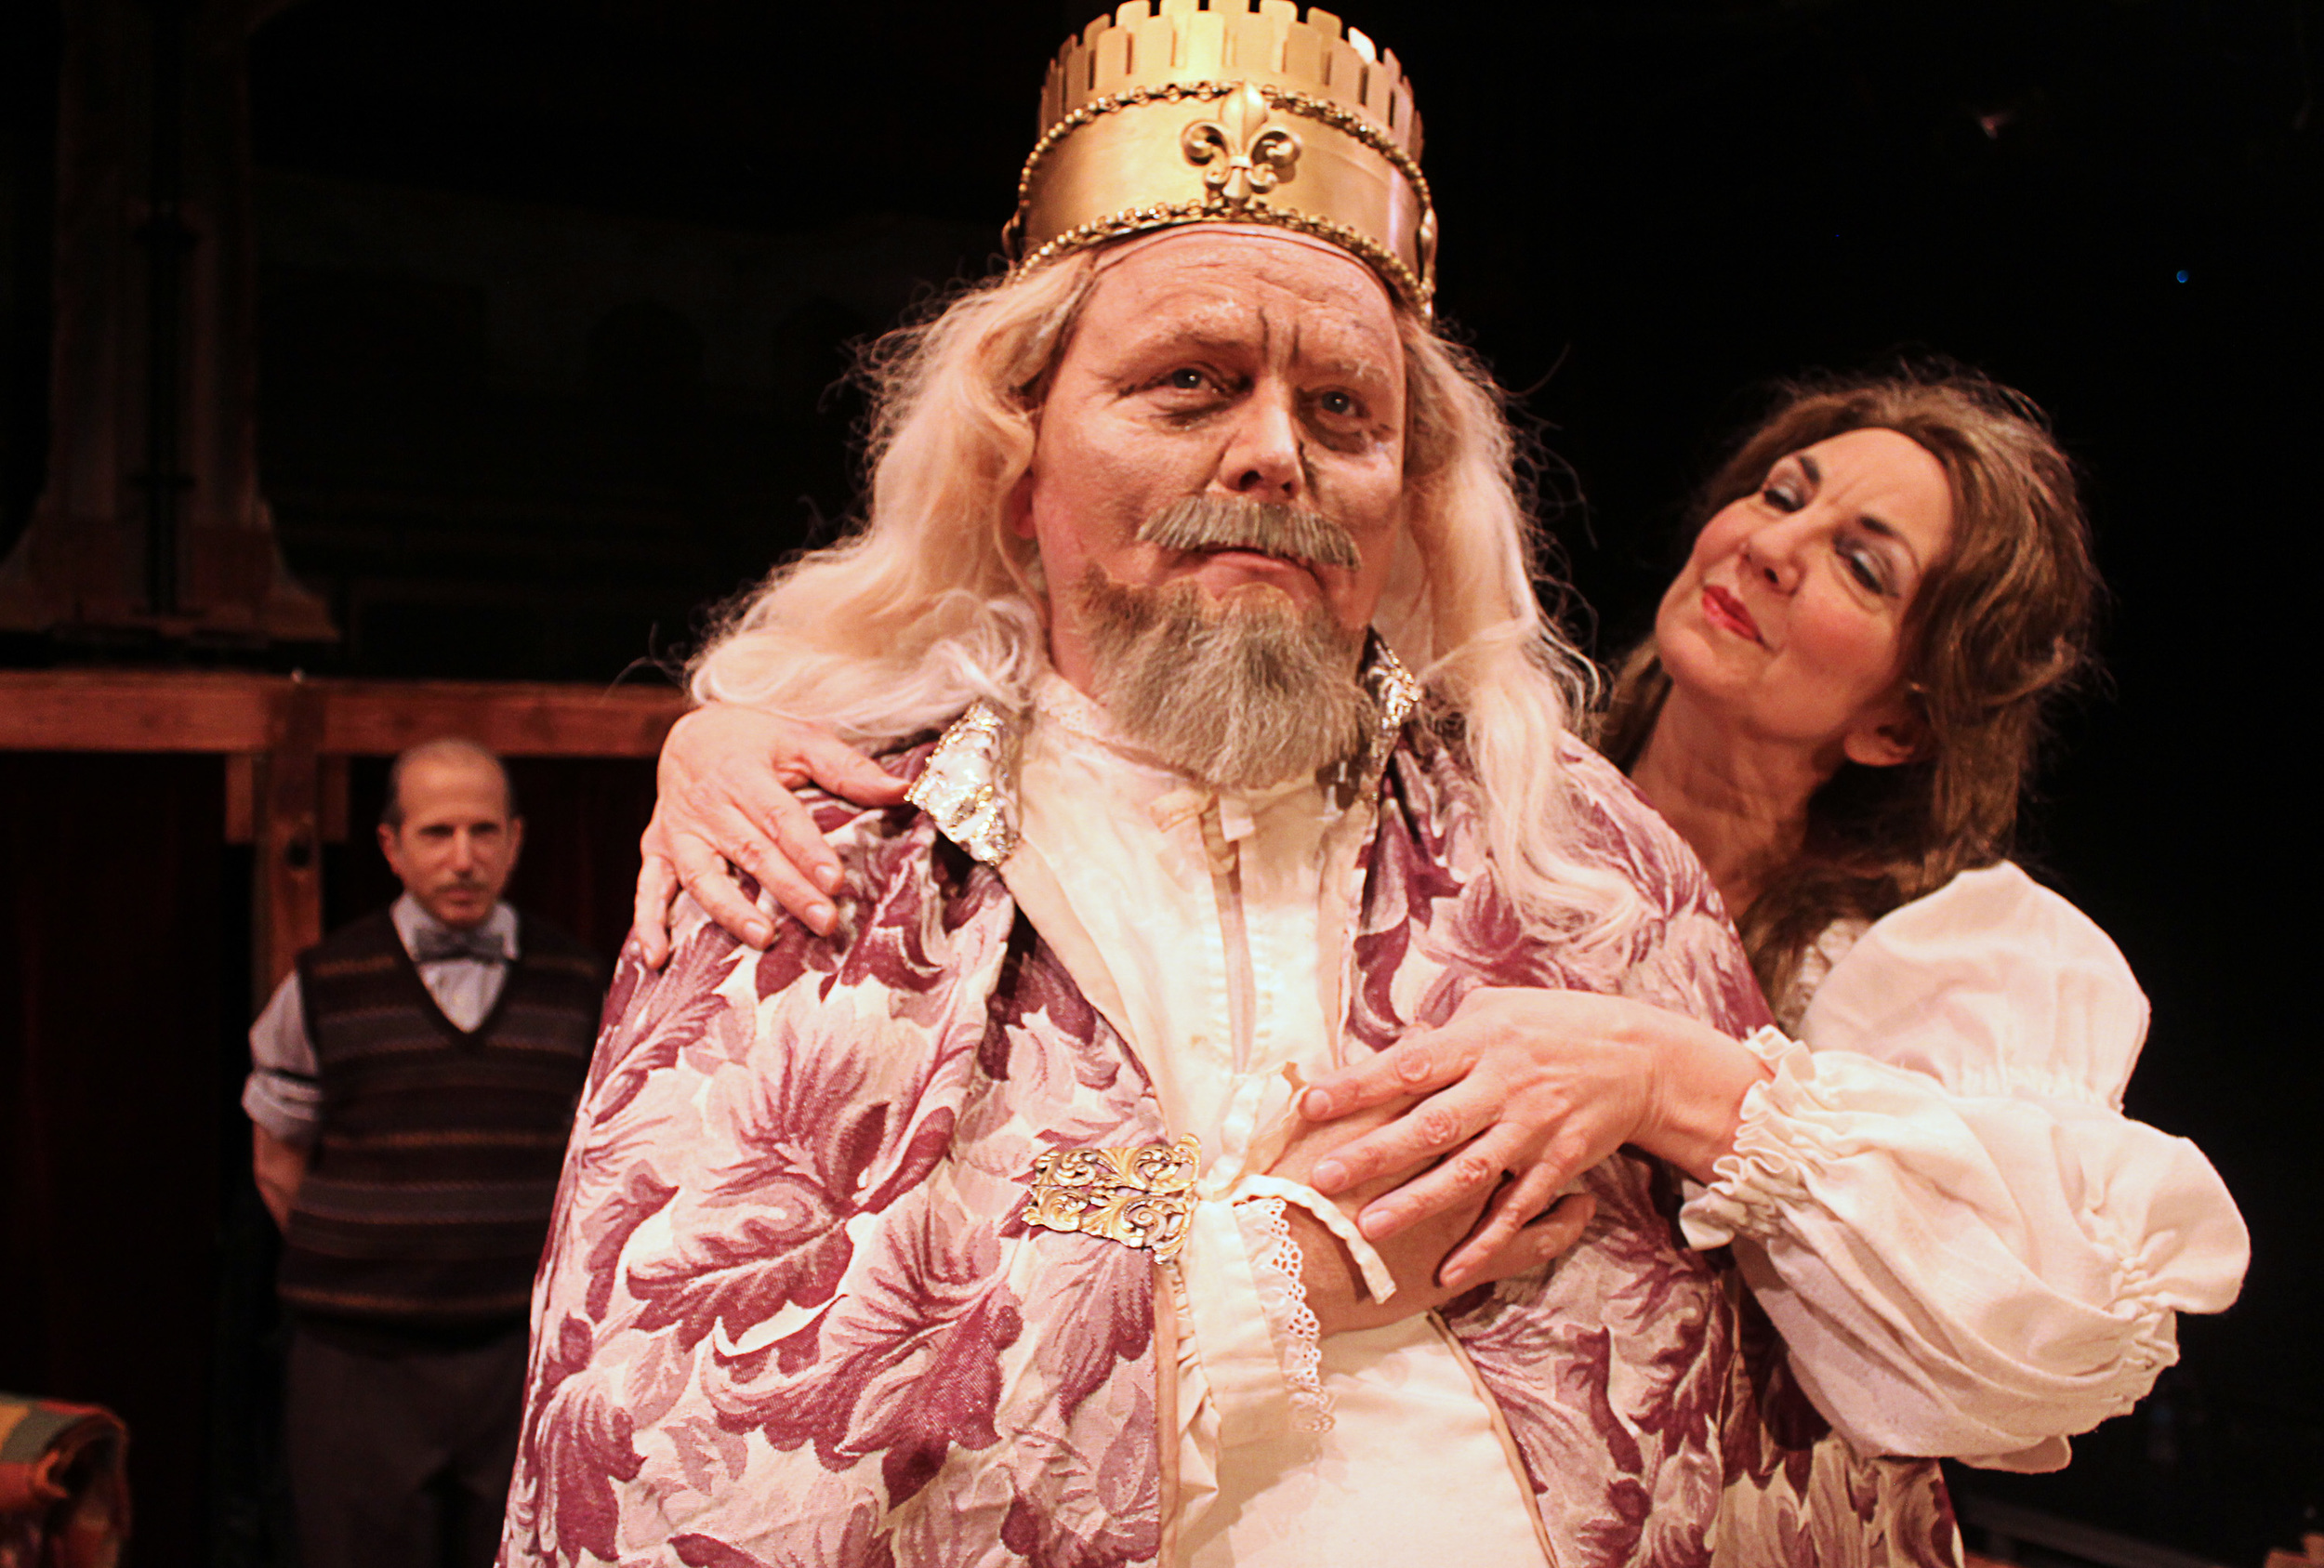 Norman (David Newhouse), Sir (J. Clark Nicholson), Her Ladyship (Cynthia Charles)